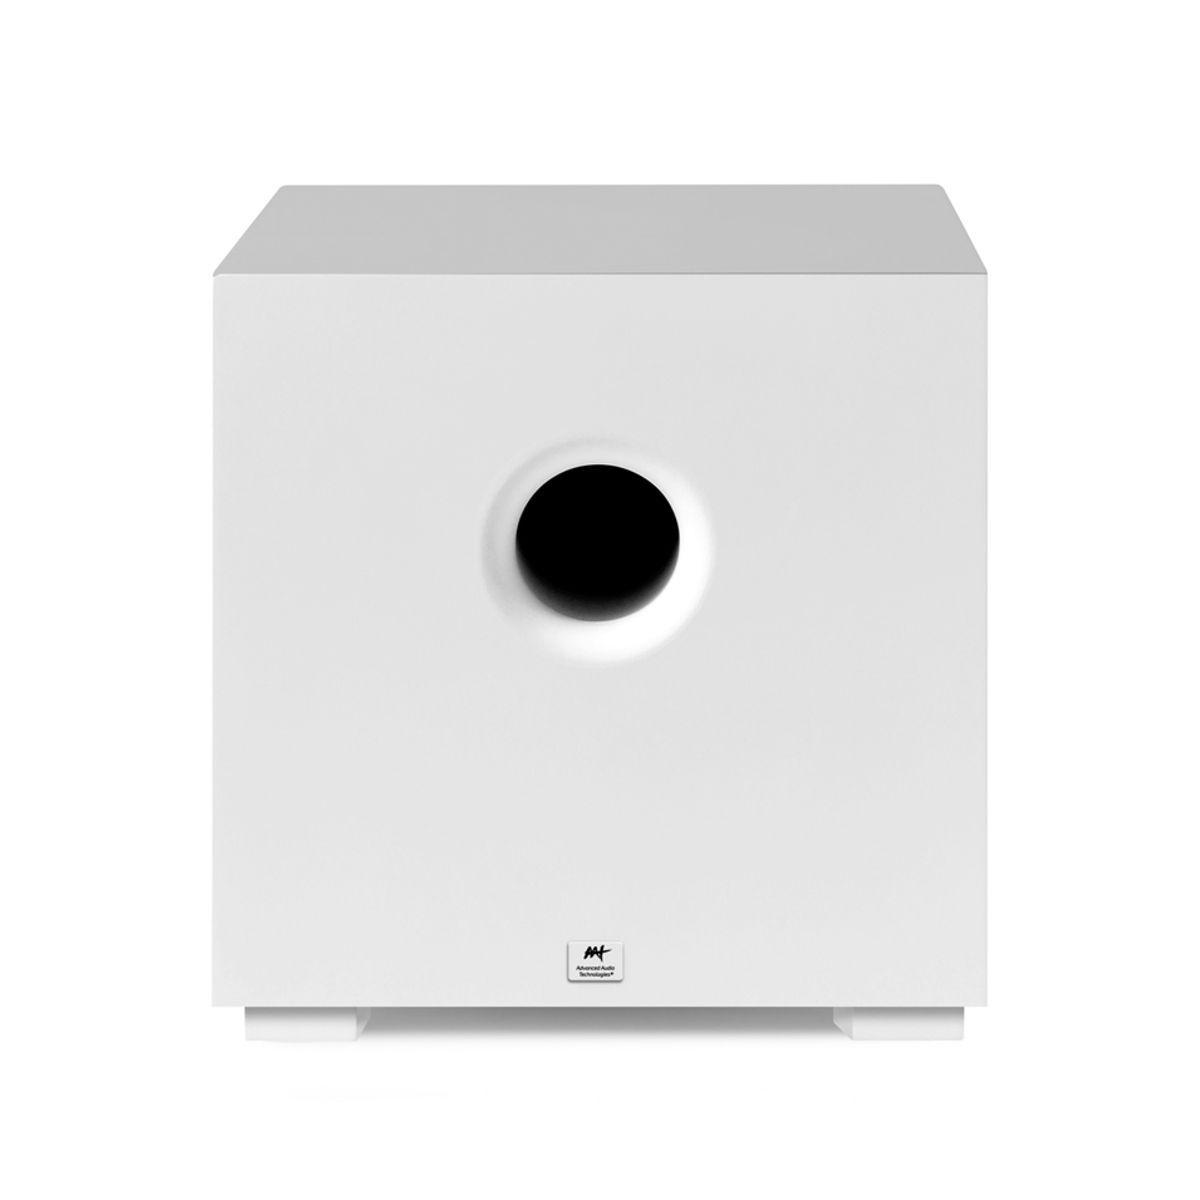 "Kit 7.1 Caixa de Embutir no Gesso LCR-A100 + LR-E100 + Subwoofer Compact Cube 8"" AAT"